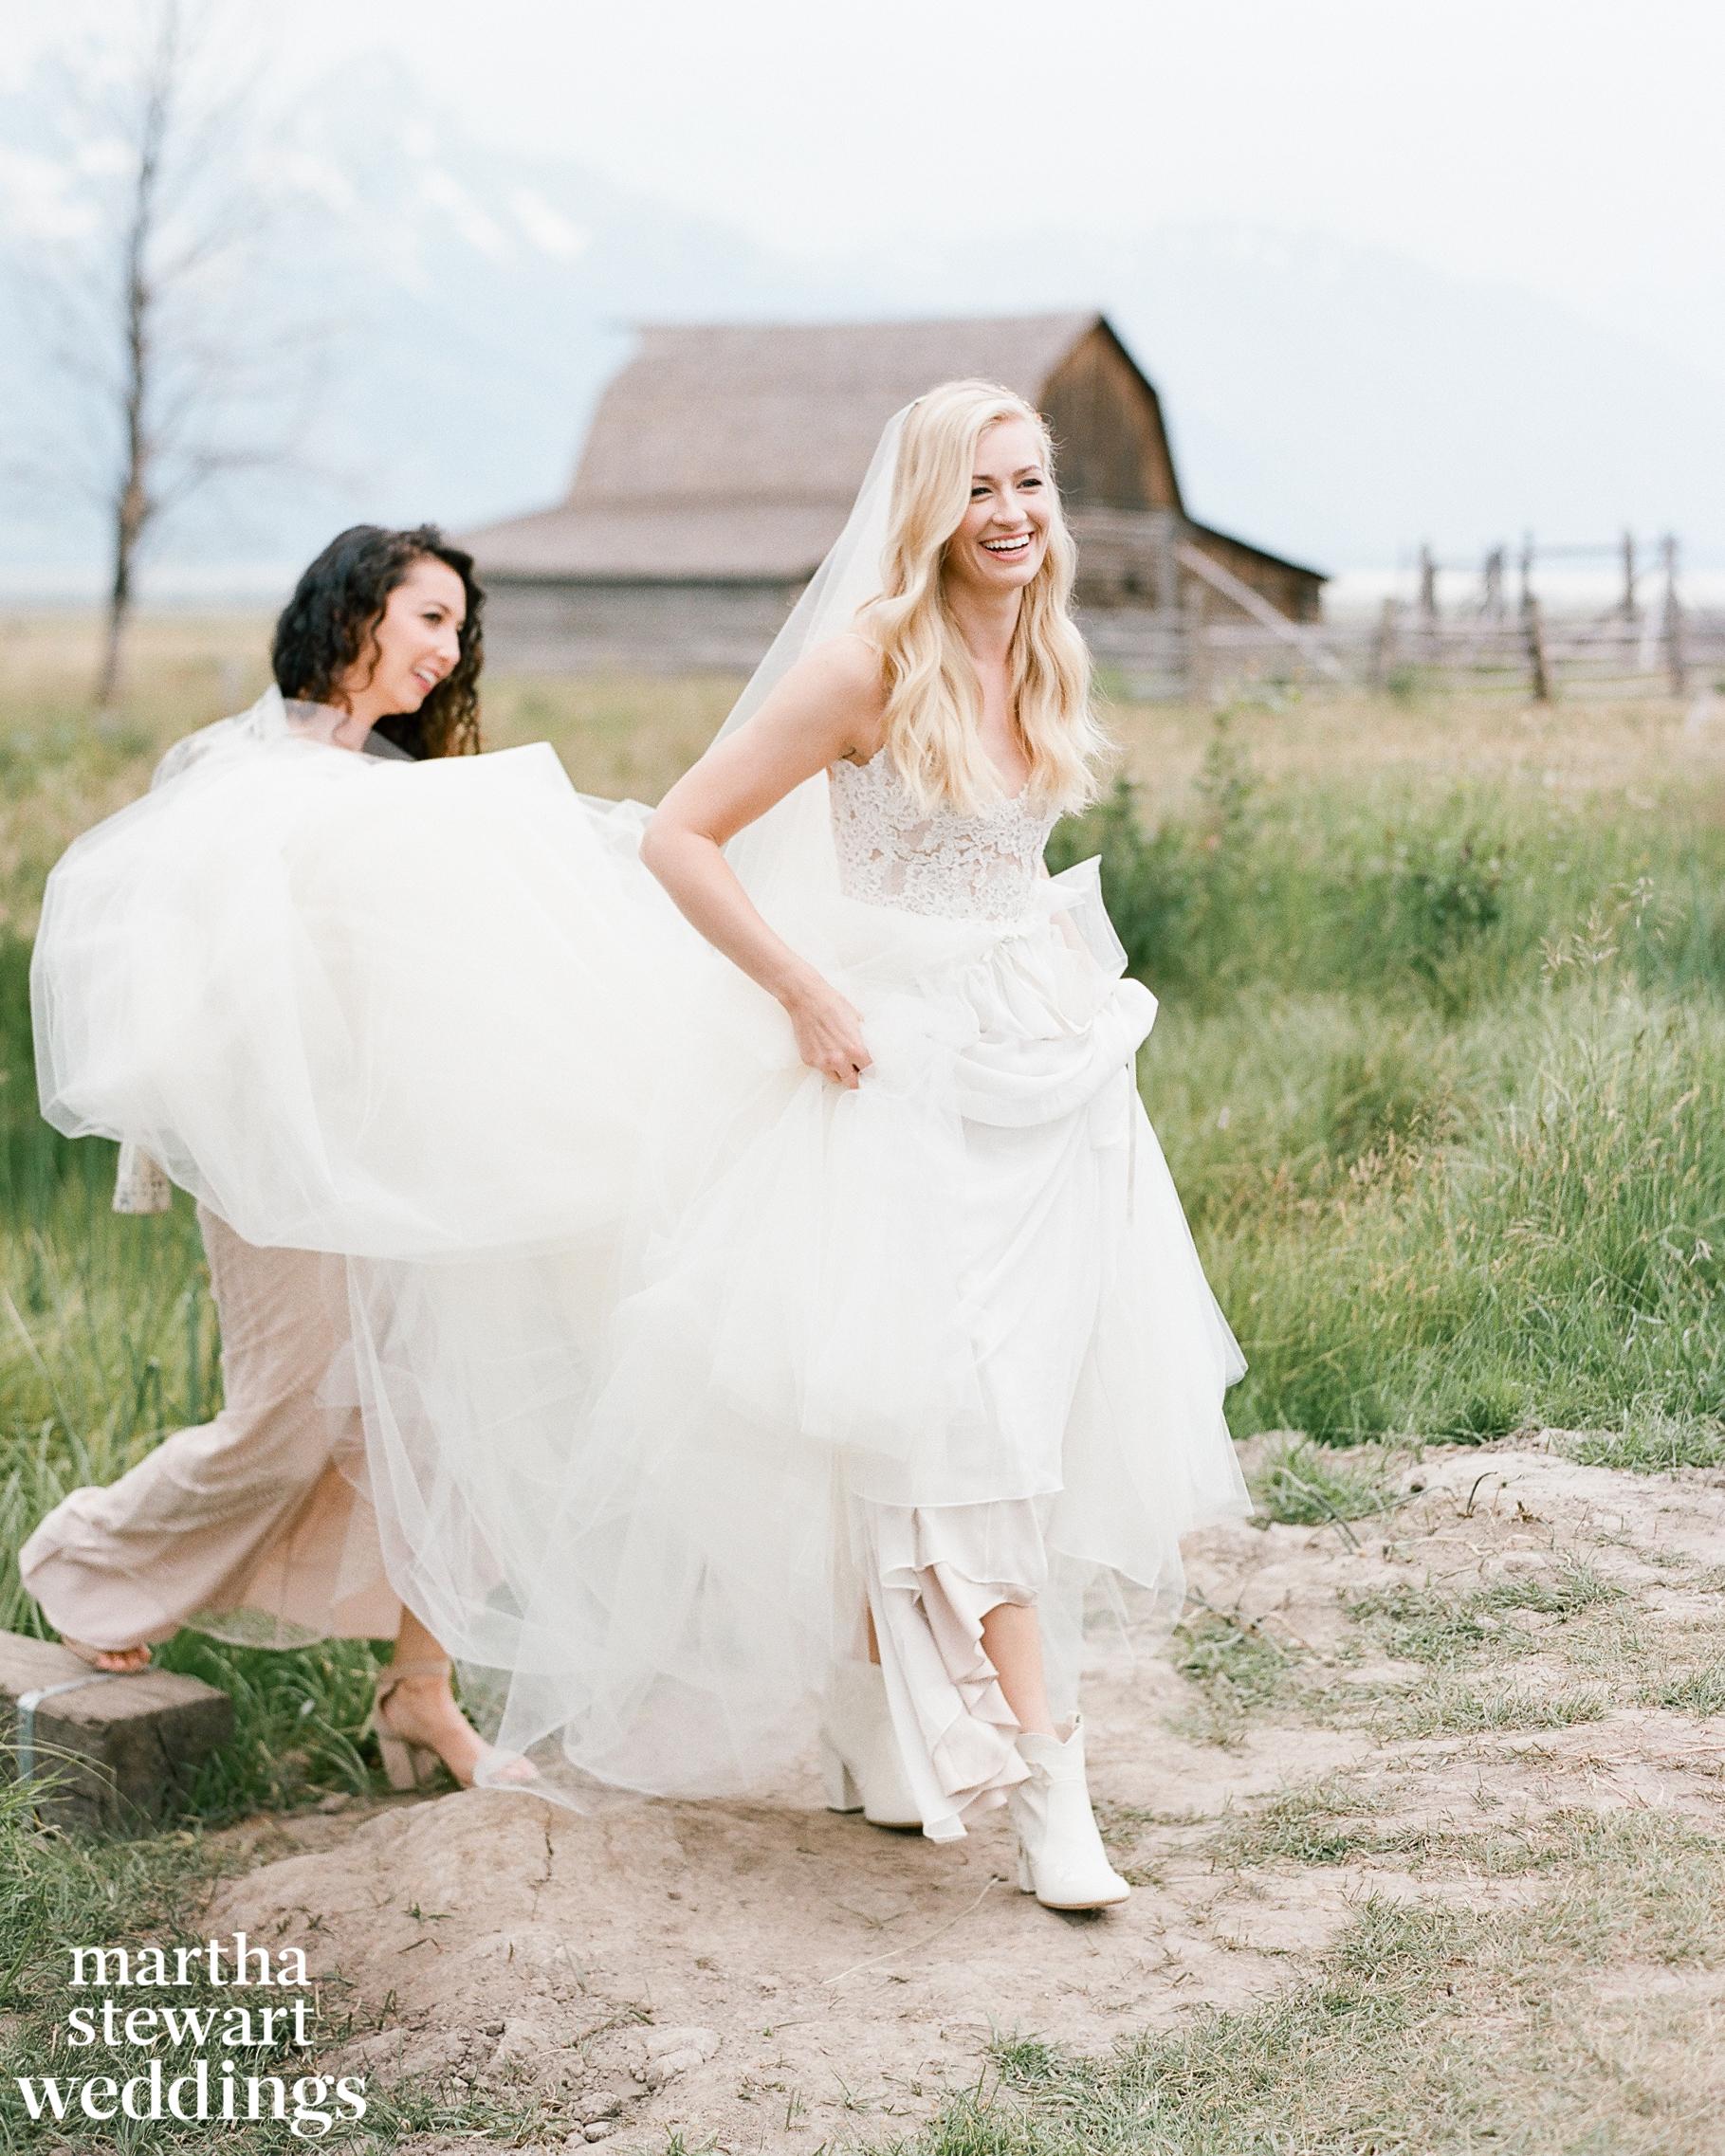 beth behrs michael gladis wedding bride boots sylvie gil